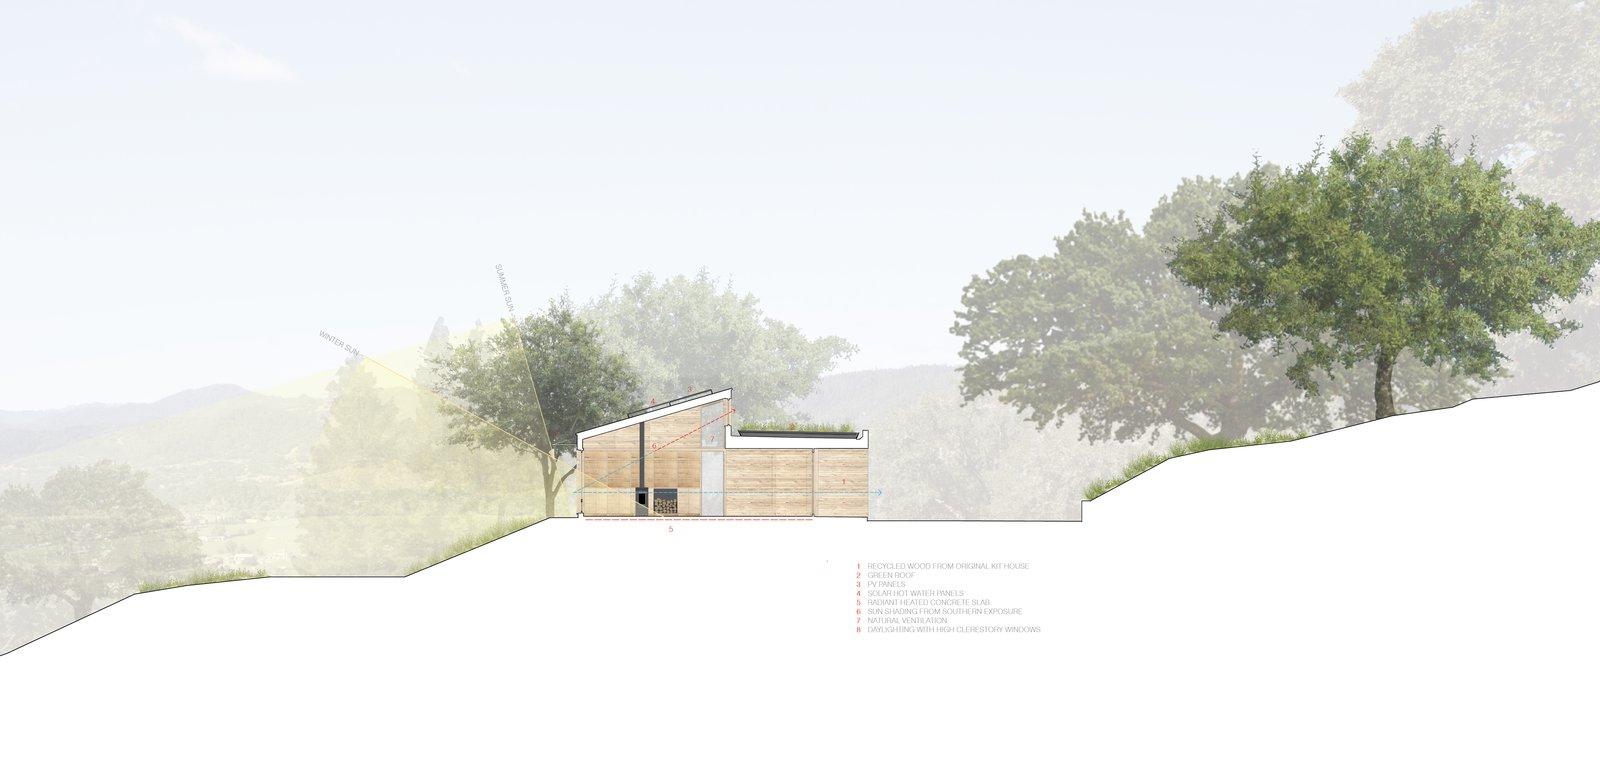 #TurnbullGriffinHaesloop #exterior #landscape #sustainability   Cloverdale Residence by Turnbull Griffin Haesloop Architects